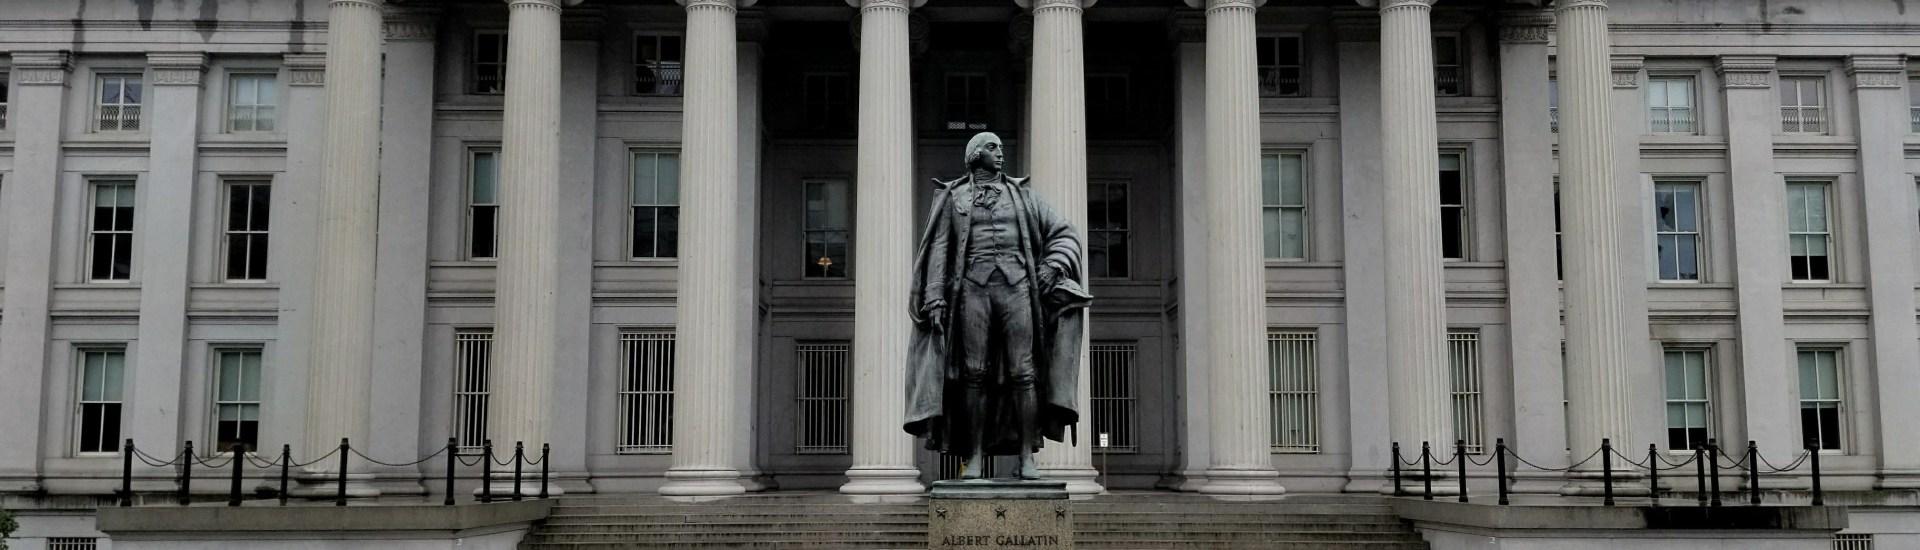 U.S._Treasury_Building_and_Albert_Gallatin_Statue